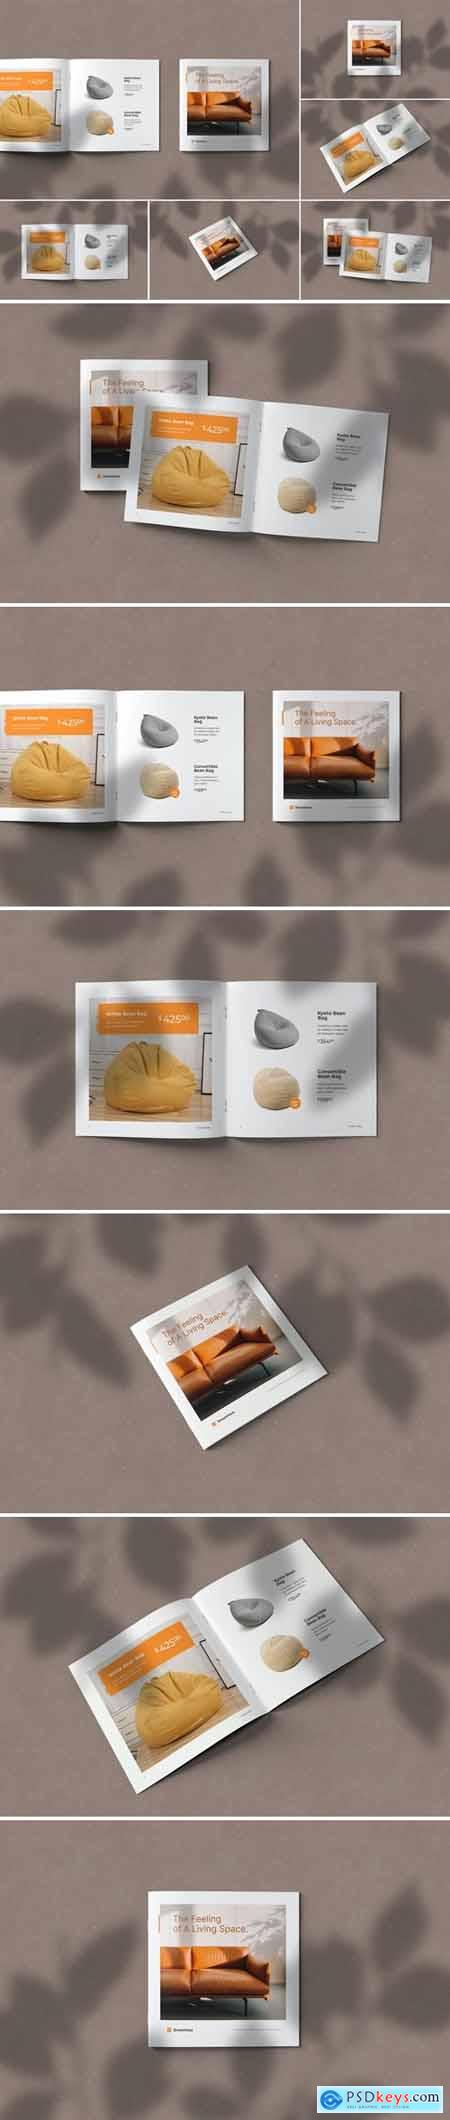 Square Brochure Catalog Mockups